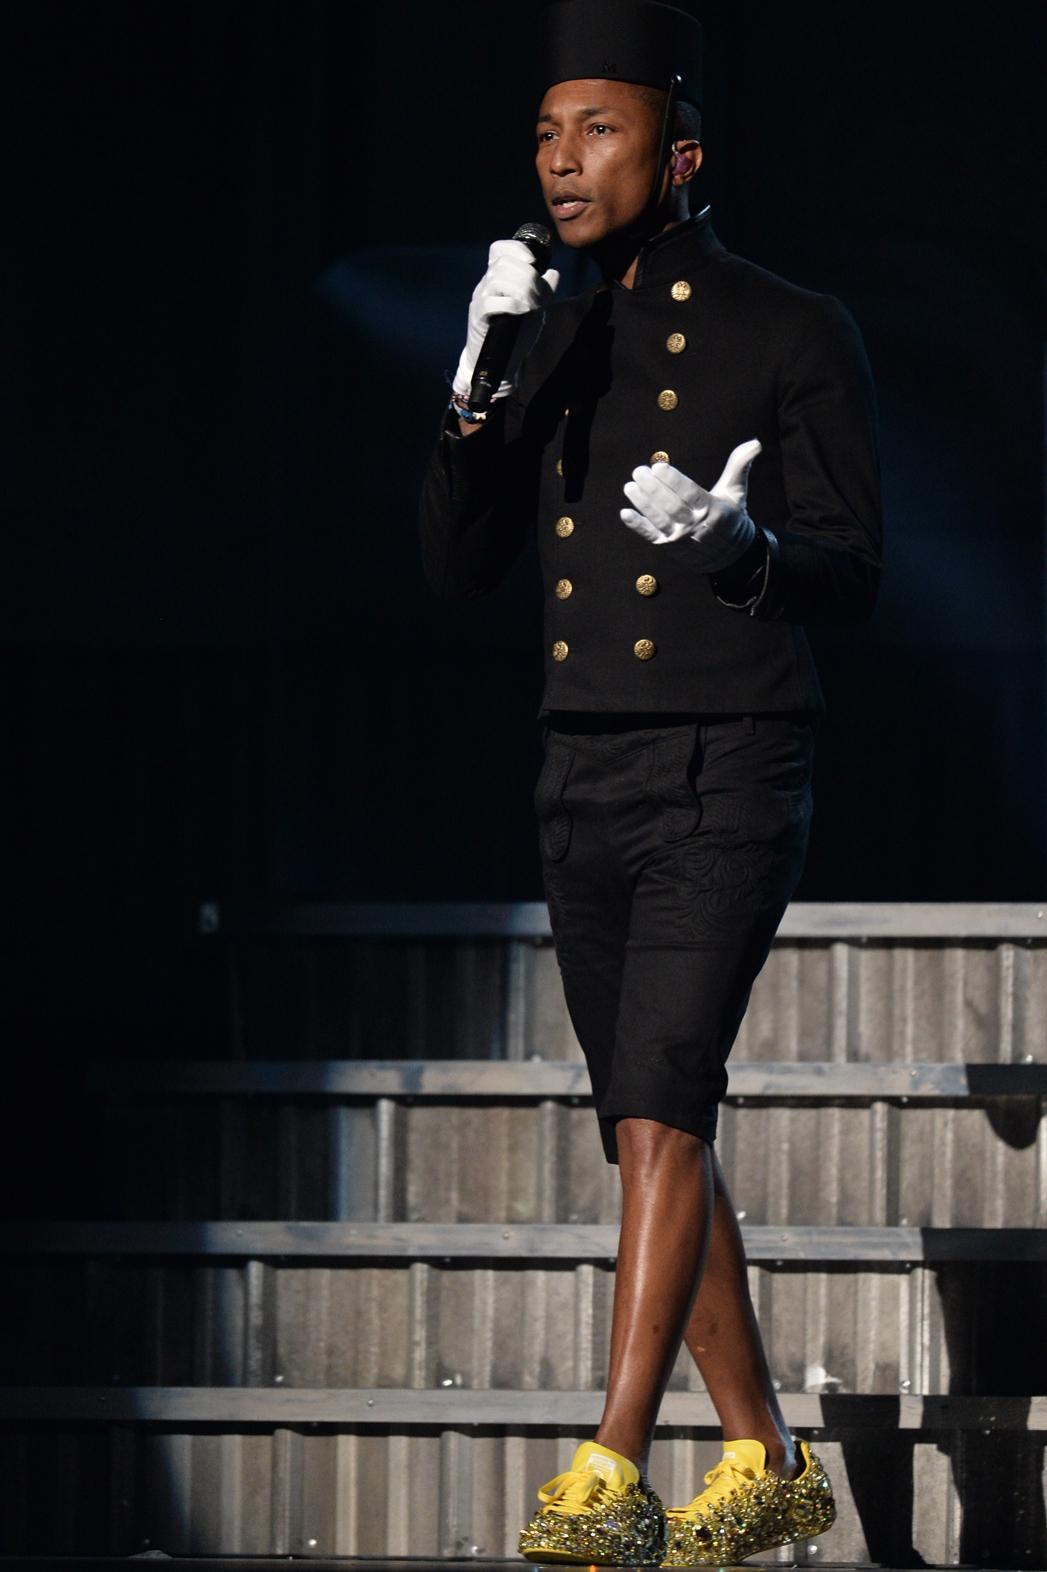 Pharrell Grammys Performance - P 2015